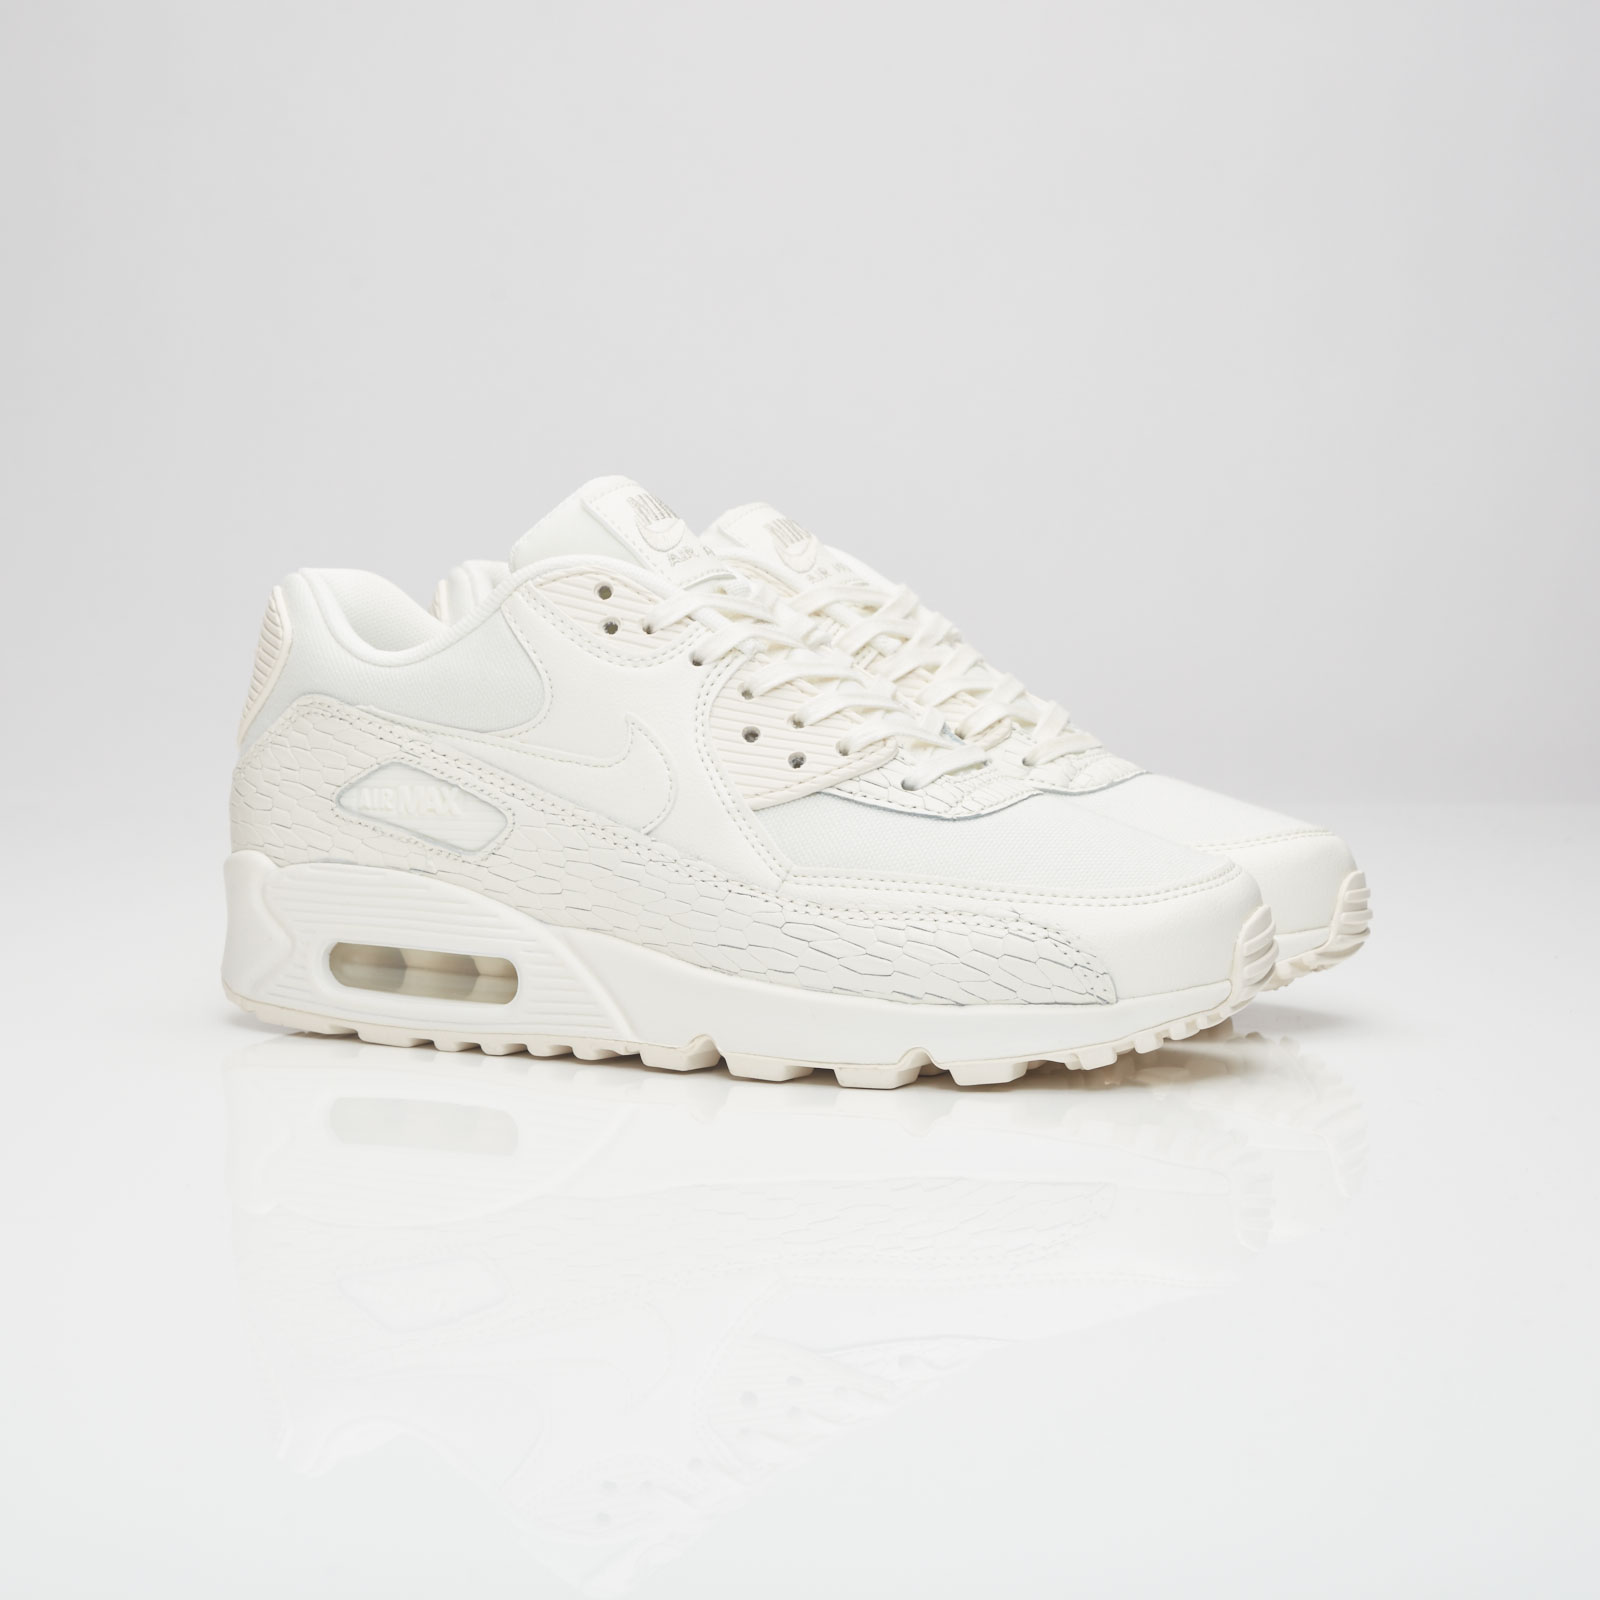 promo code f7e8d 90914 Nike Sportswear Wmns Air Max 90 Premium Leather